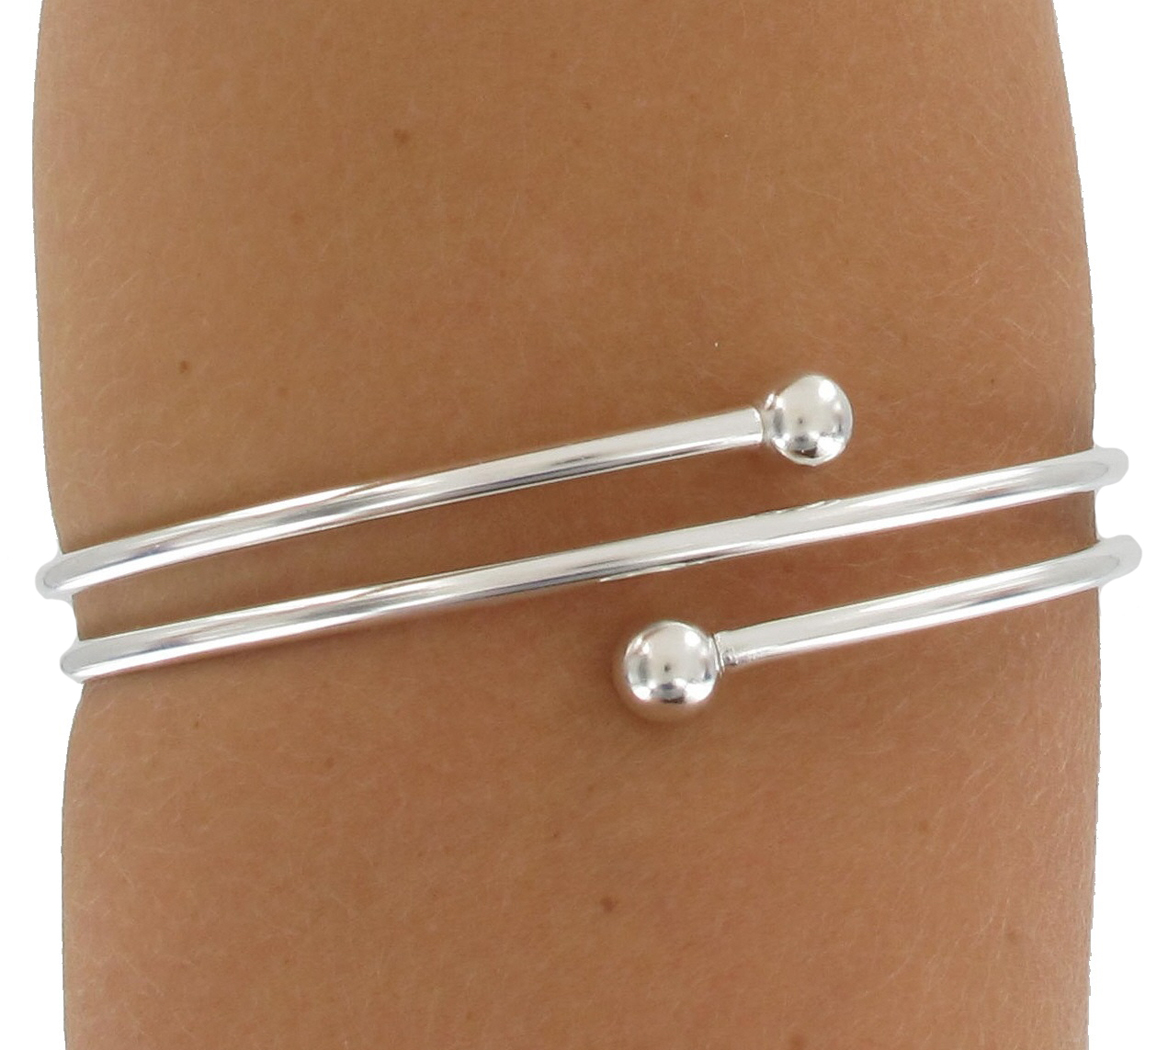 KY amp Co USA Made Bracelet Upper Arm Silver Tone Triple Armlet Ball End